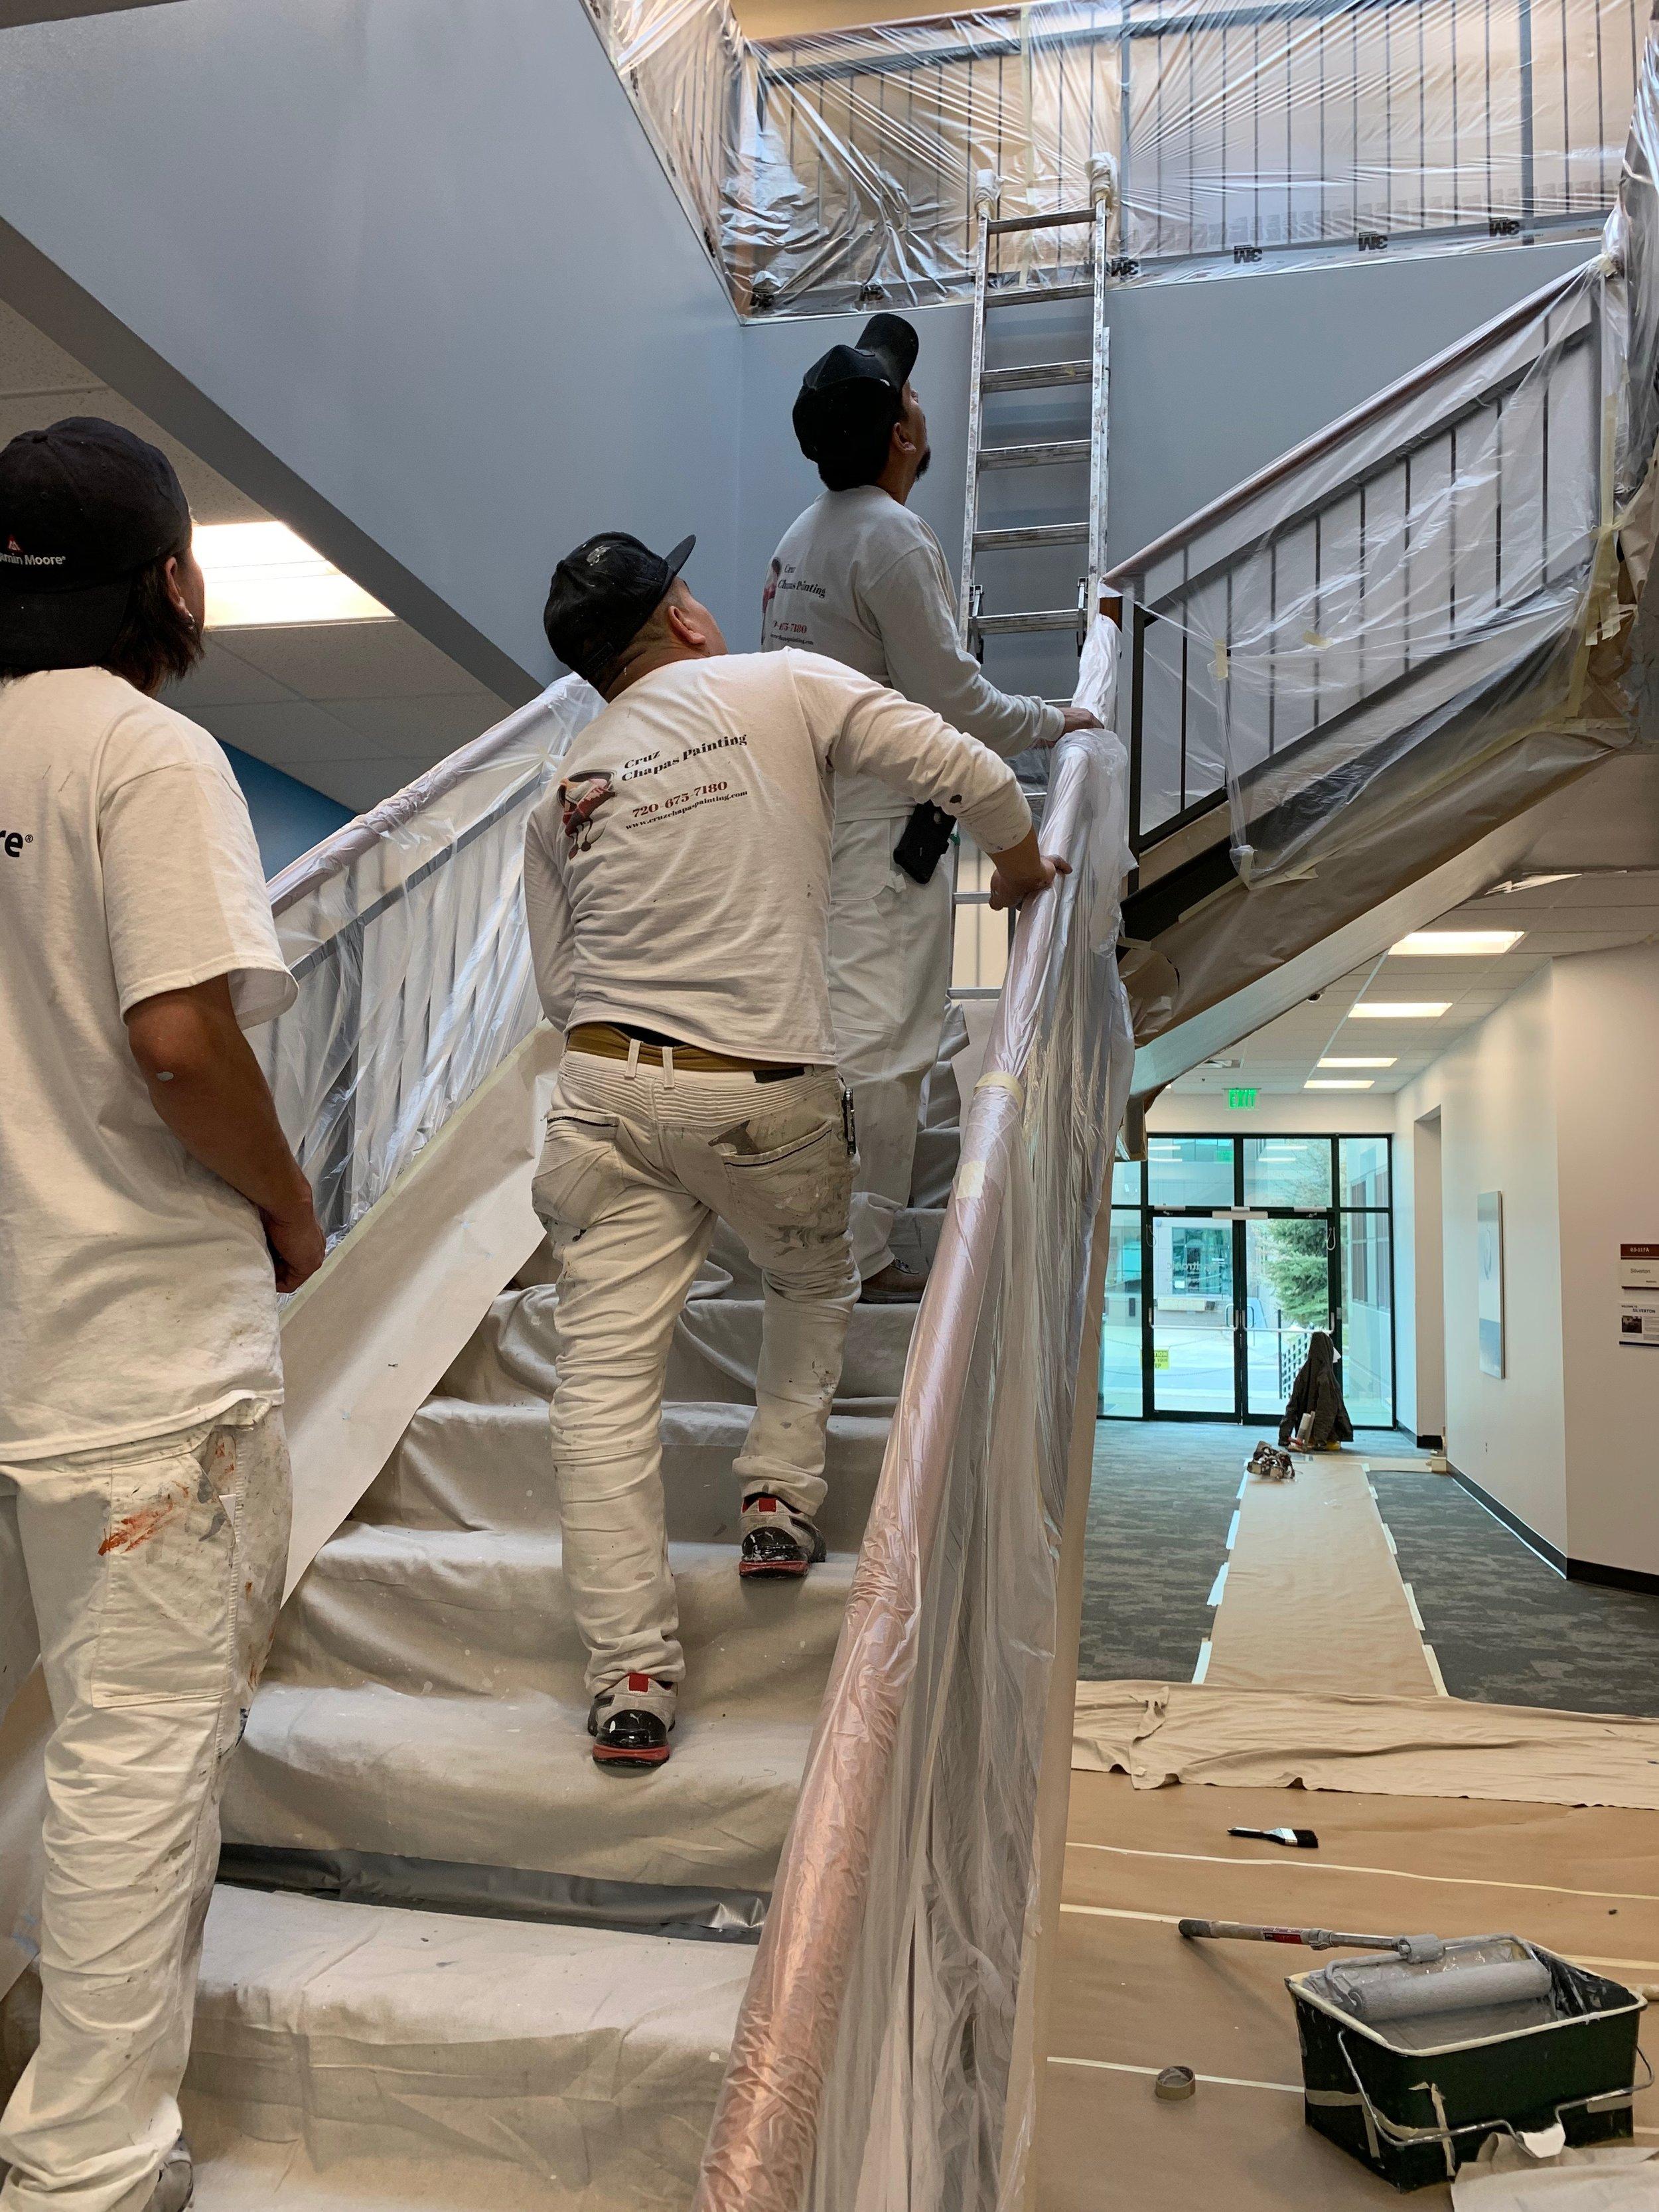 medtronic building threecore stairwell 4-27-19 #13.JPG